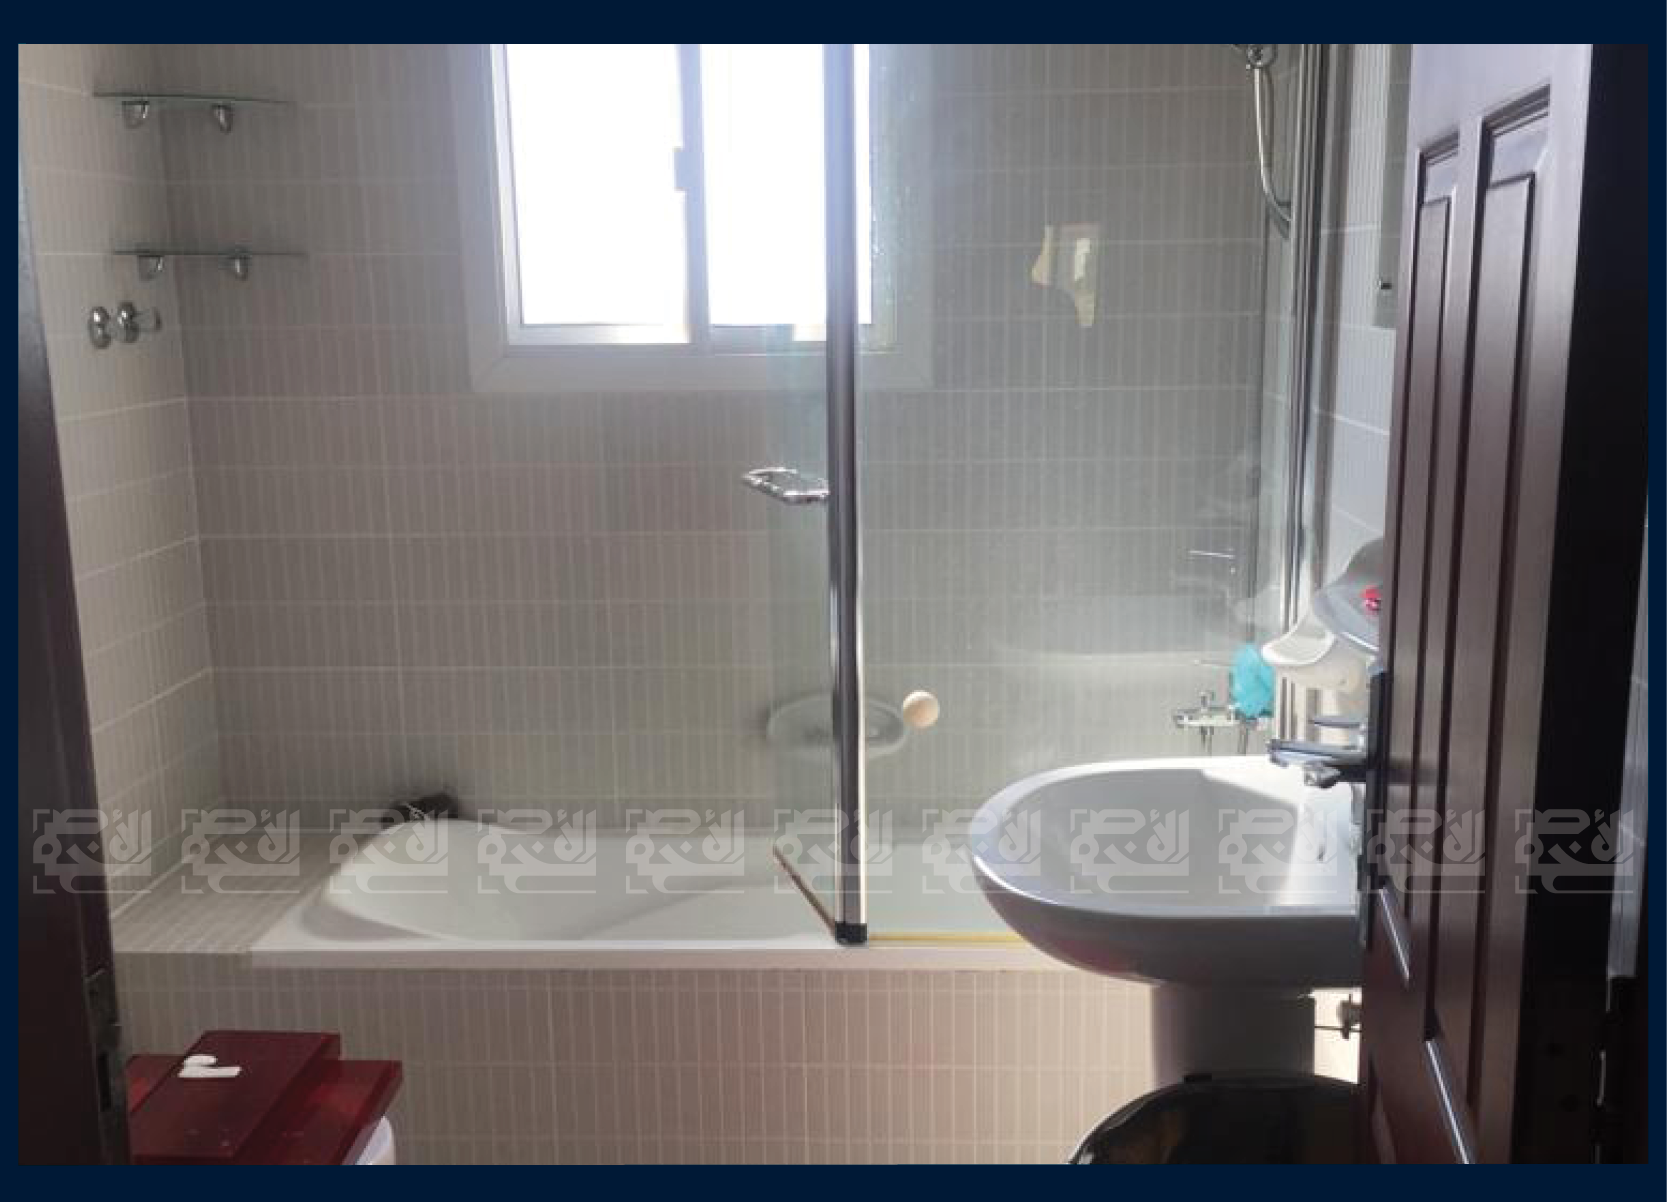 4 Bedrooms Standalone Villa in Al Dafna ( 4BR-Dafna)